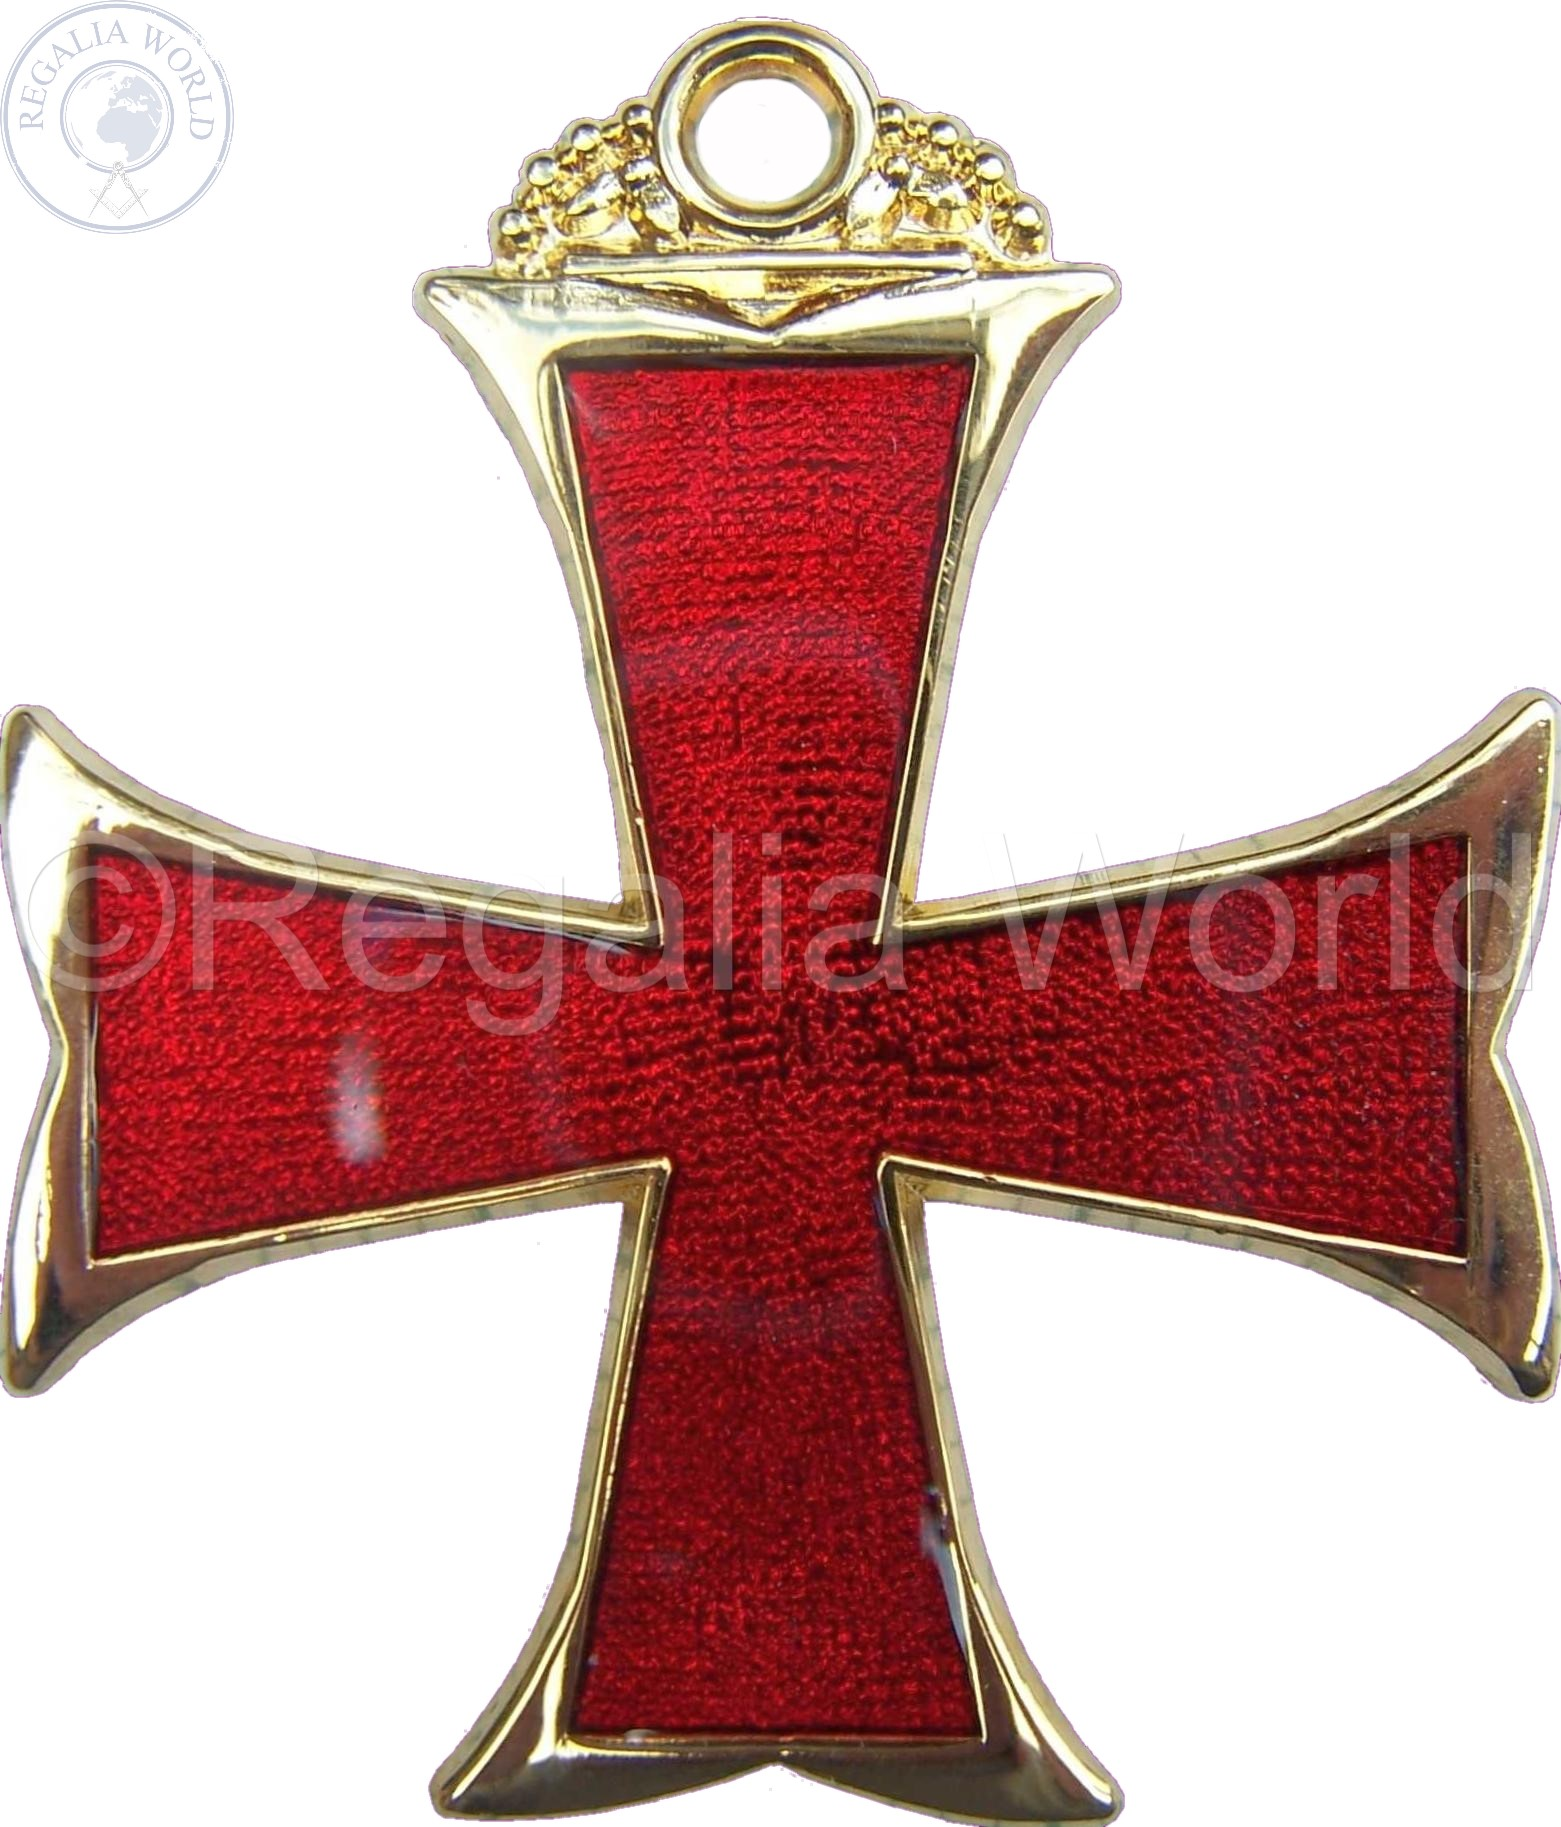 CBCS/PEC red cross jewel